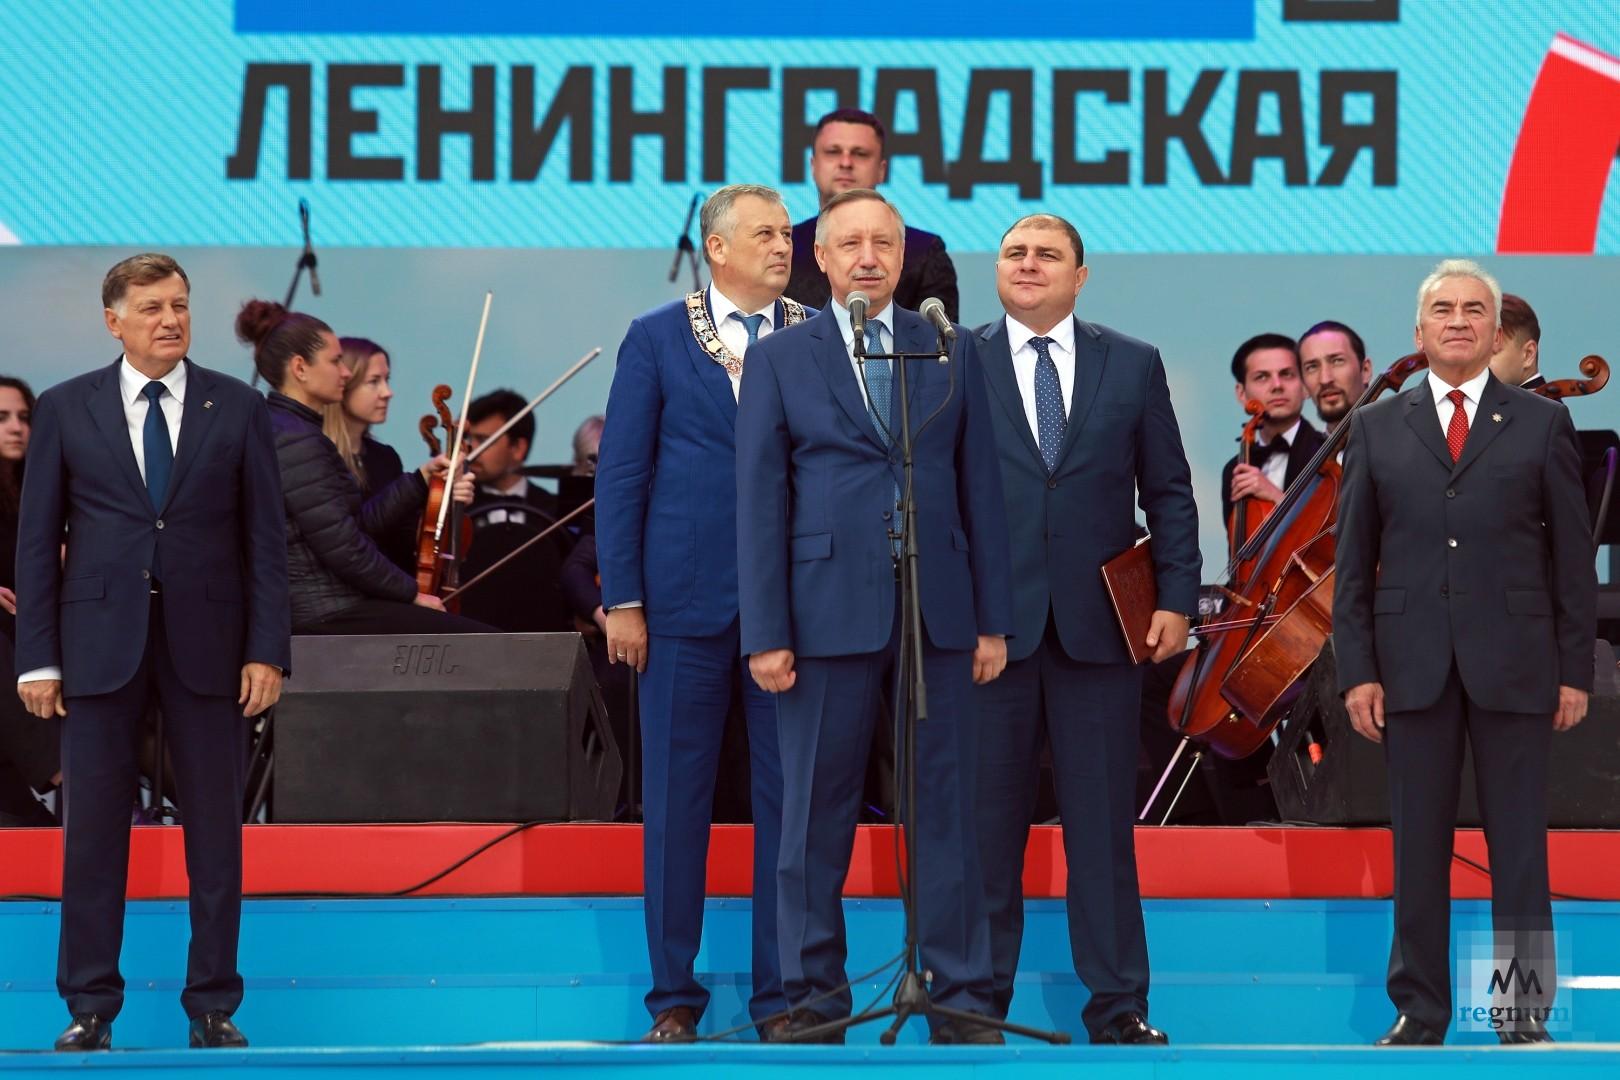 Вячеслав Макаров, Александр Дрозденко, Александр Беглов